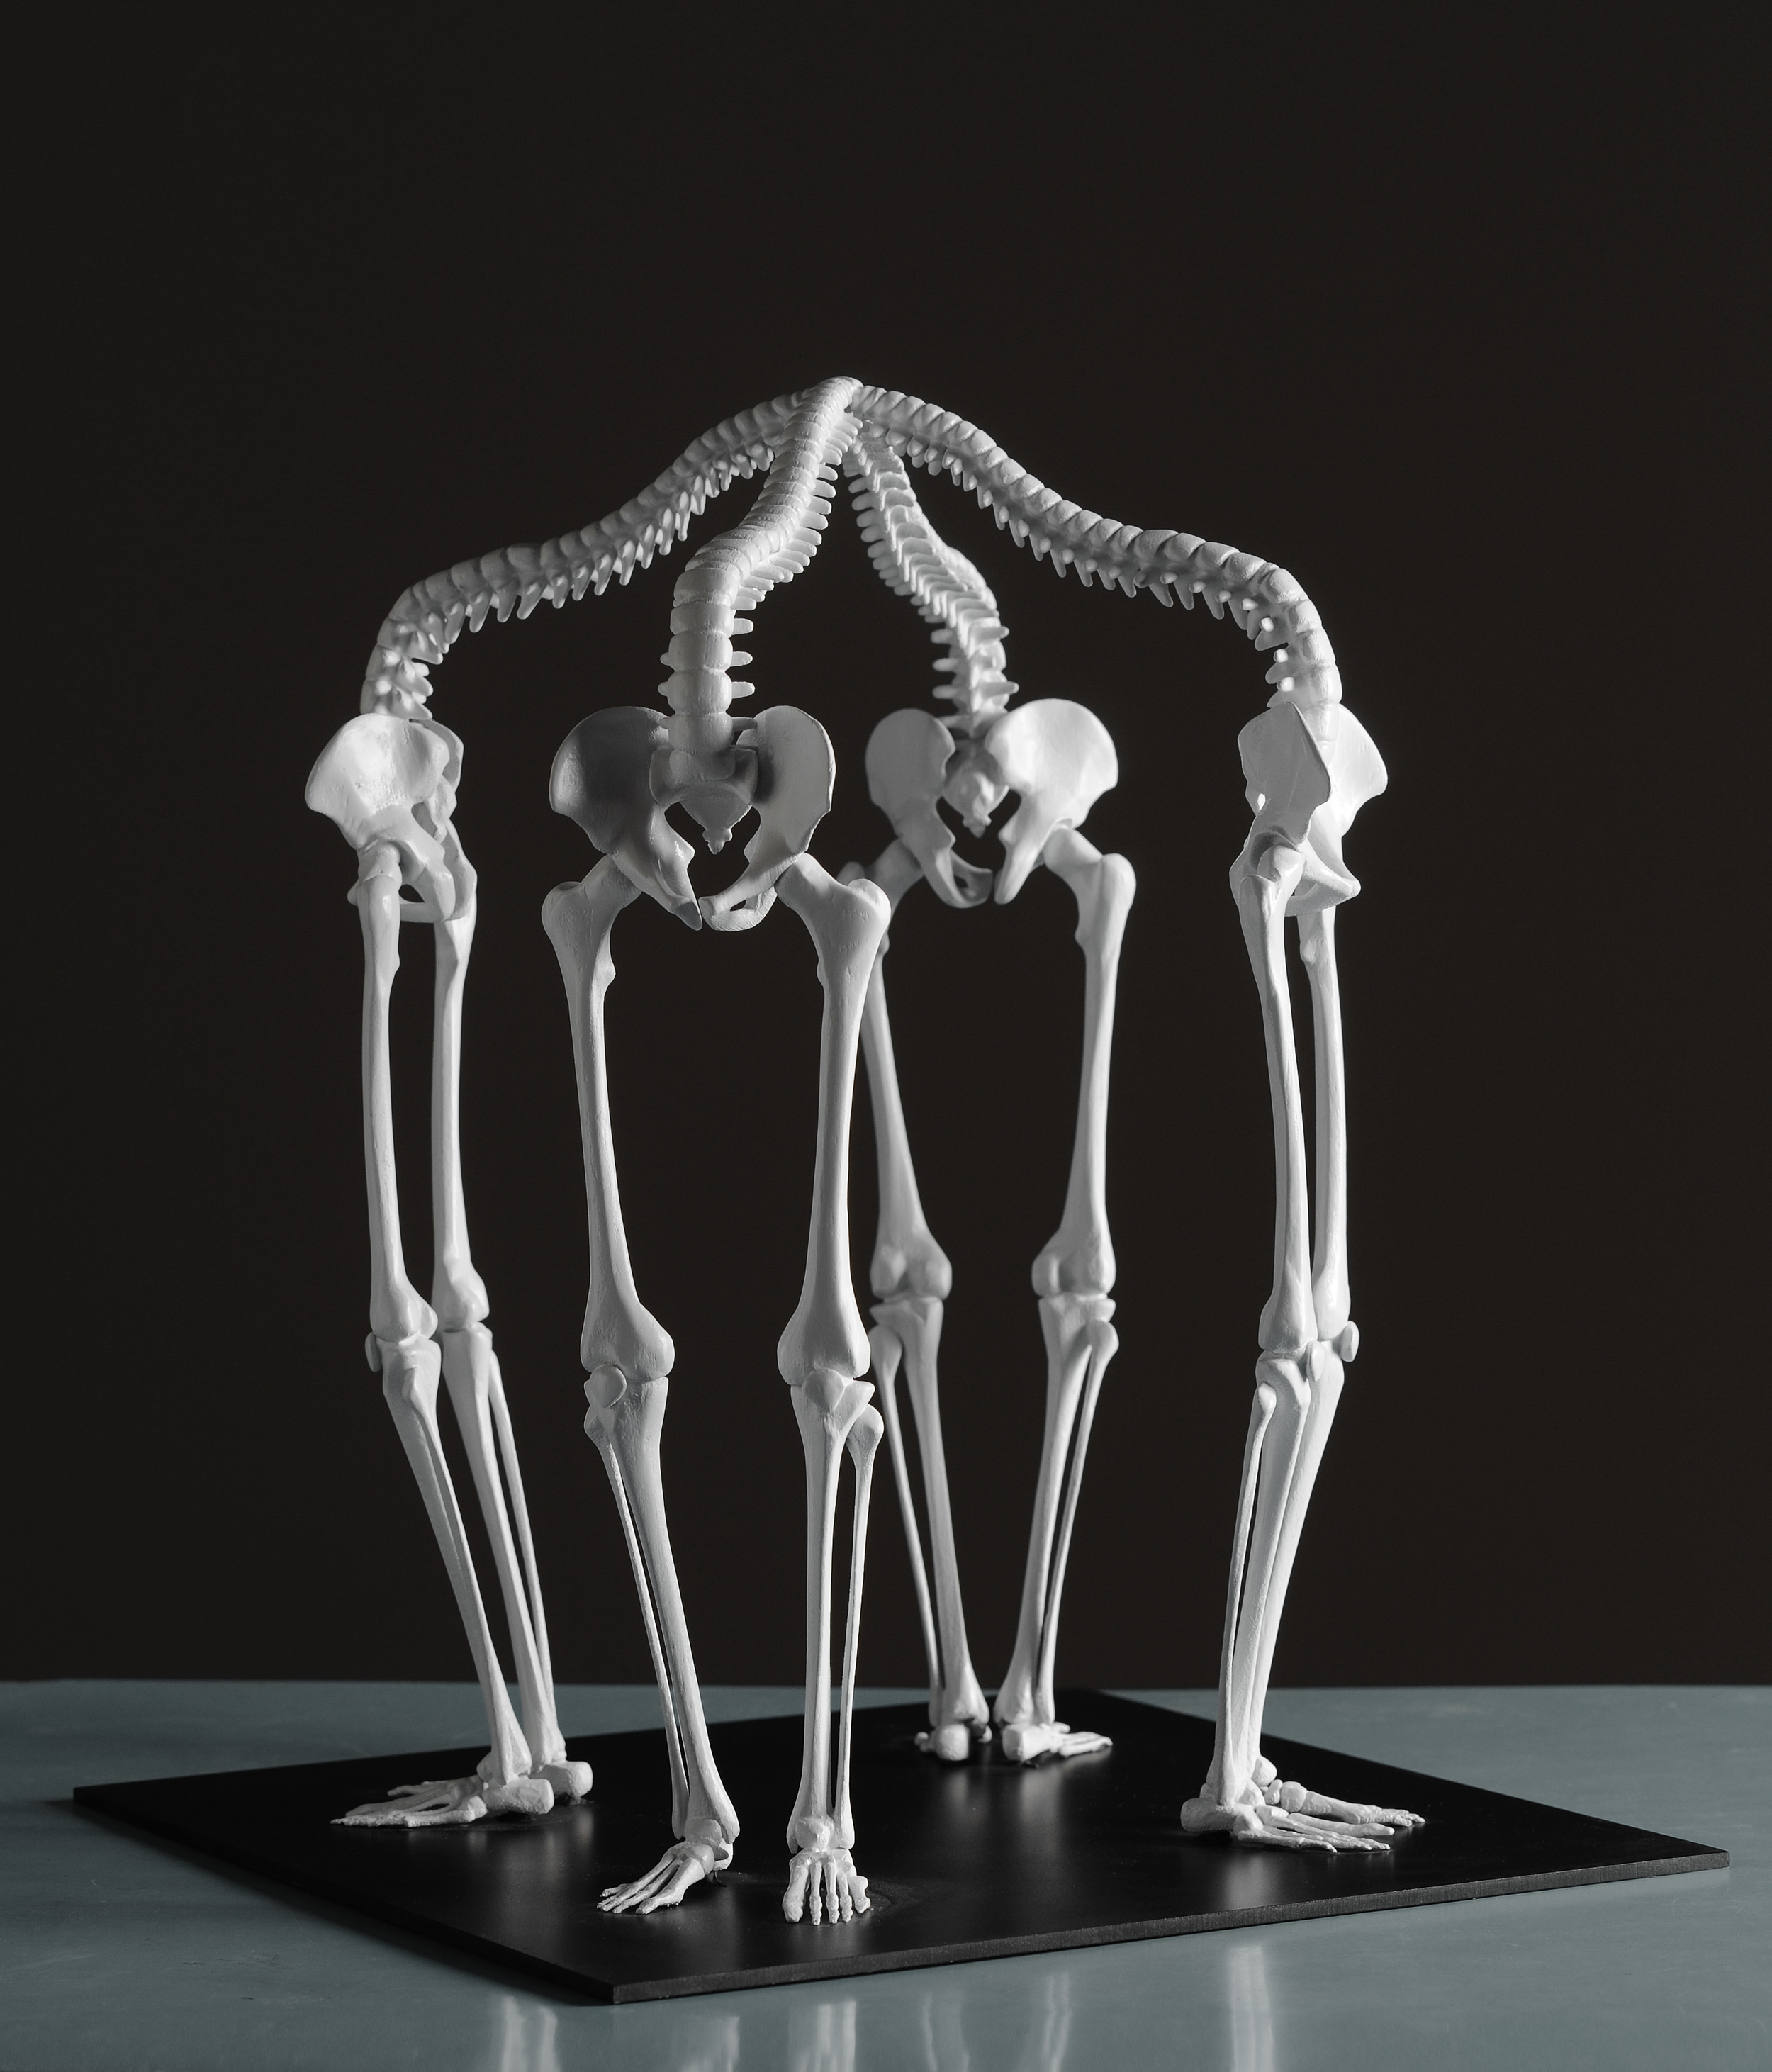 K2(Communication Cycle), gypsum composite(3D project Digital Sculptures),2011 @Monika Horčicová/ @Photo Ondřej Polák